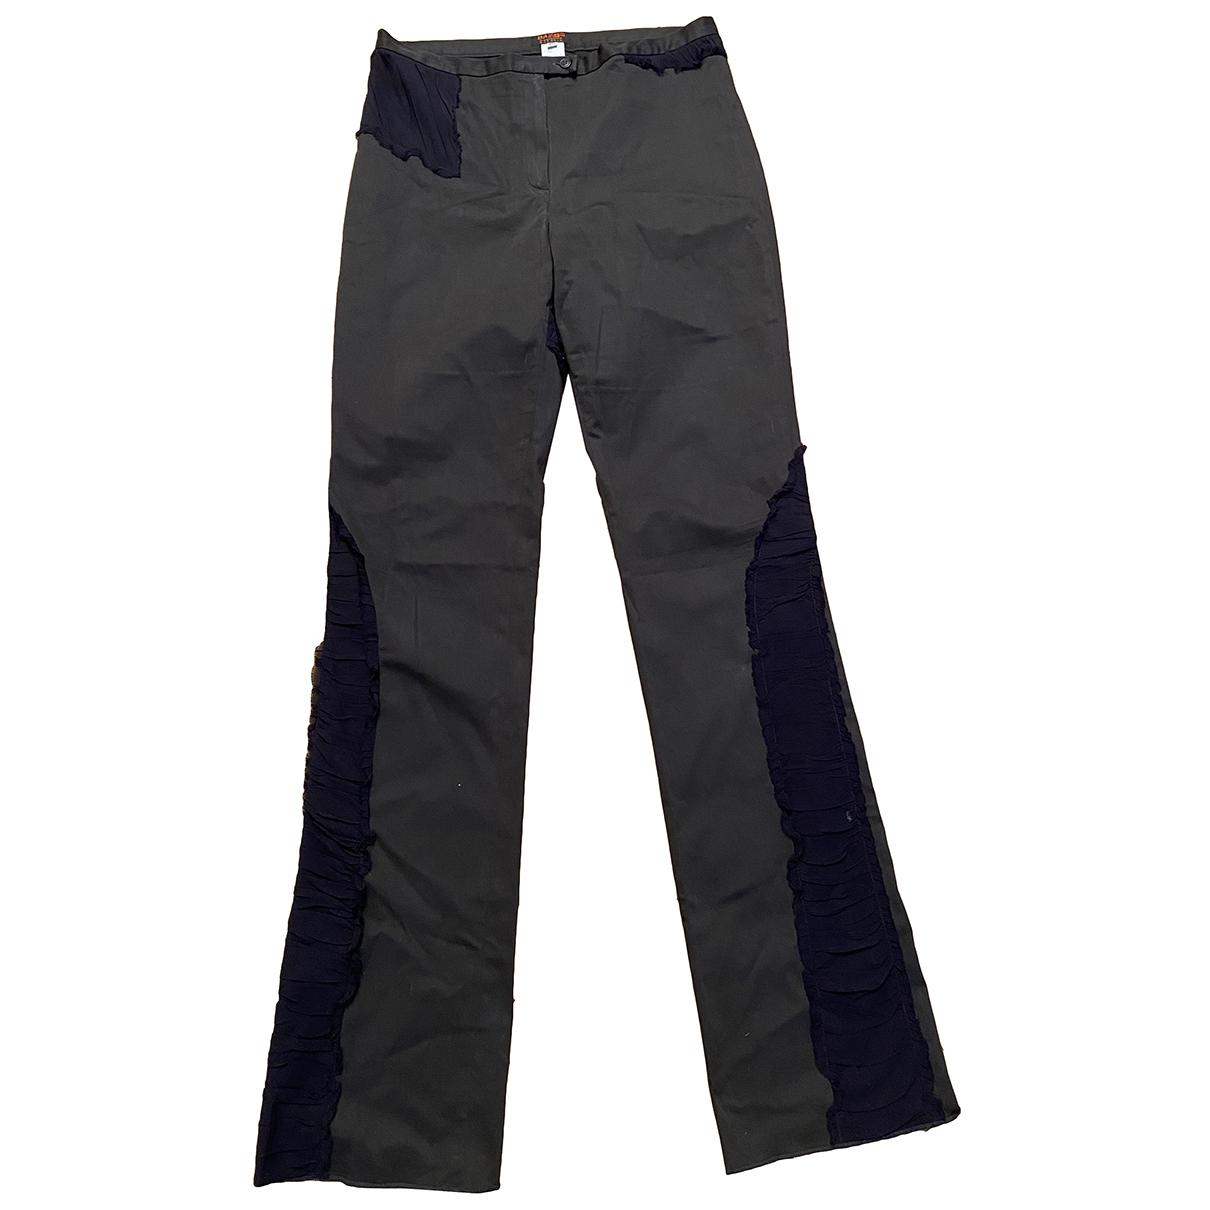 Pantalon recto Christian Lacroix